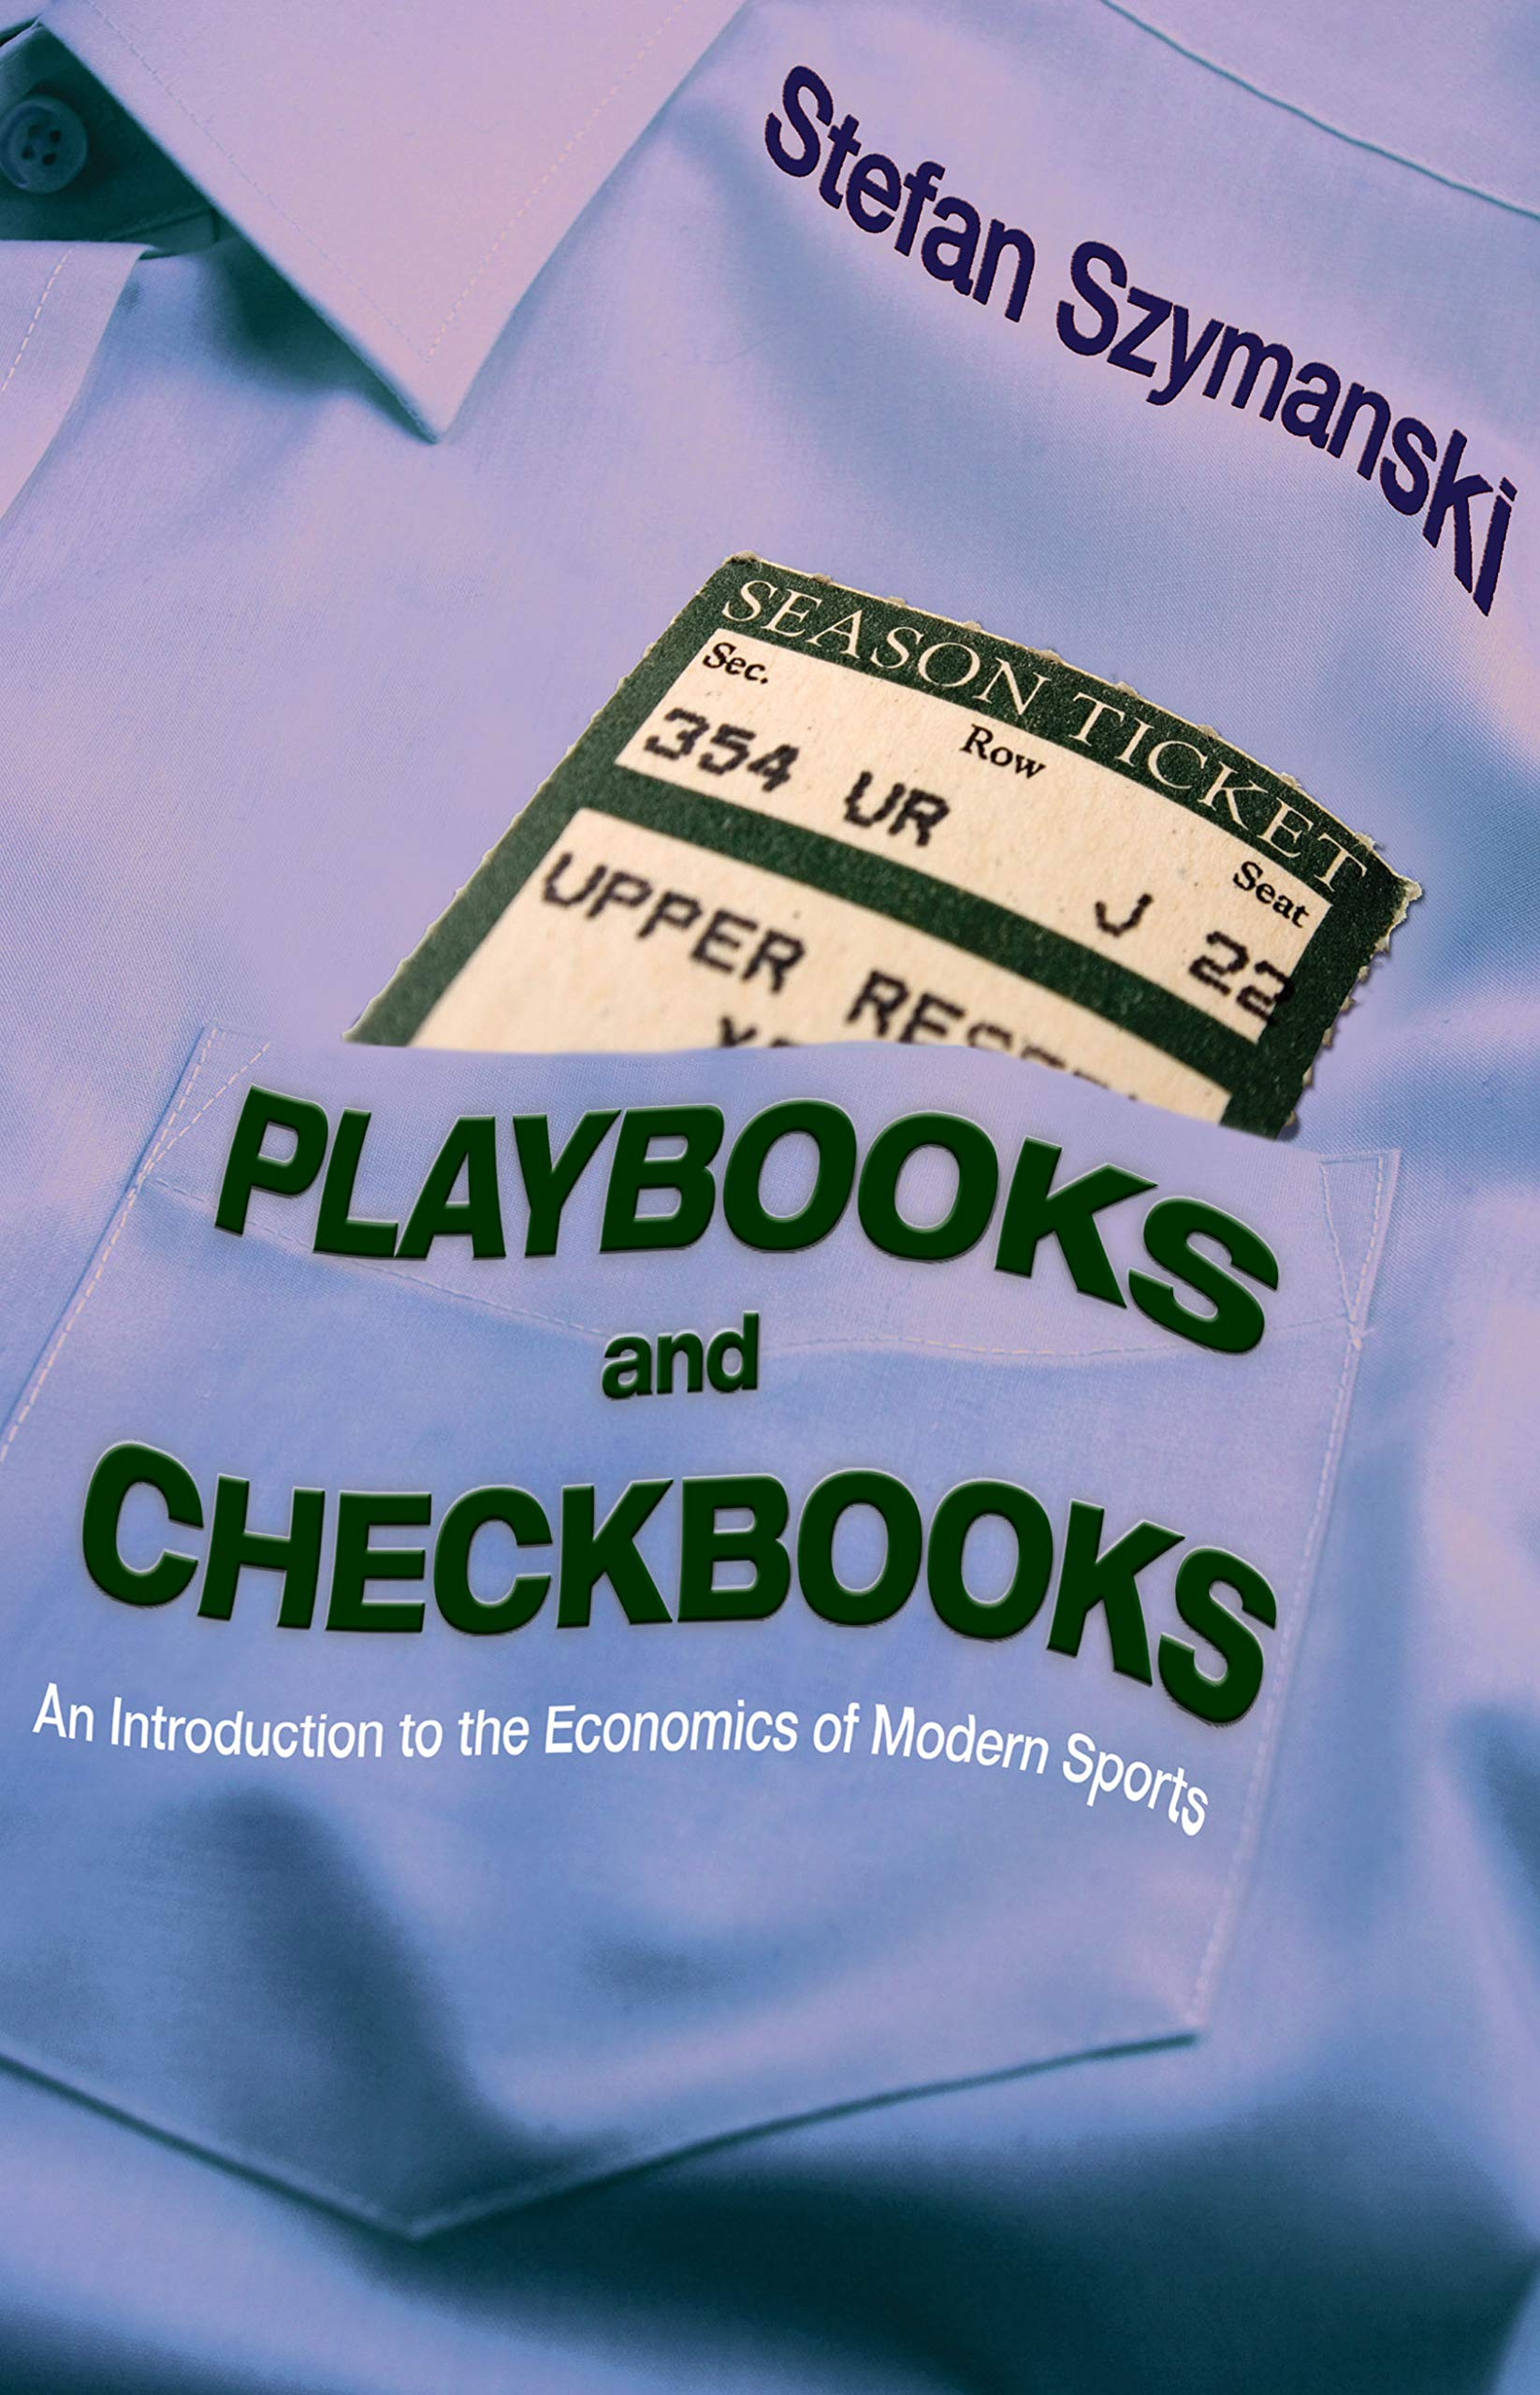 checkbooks pdf books and play